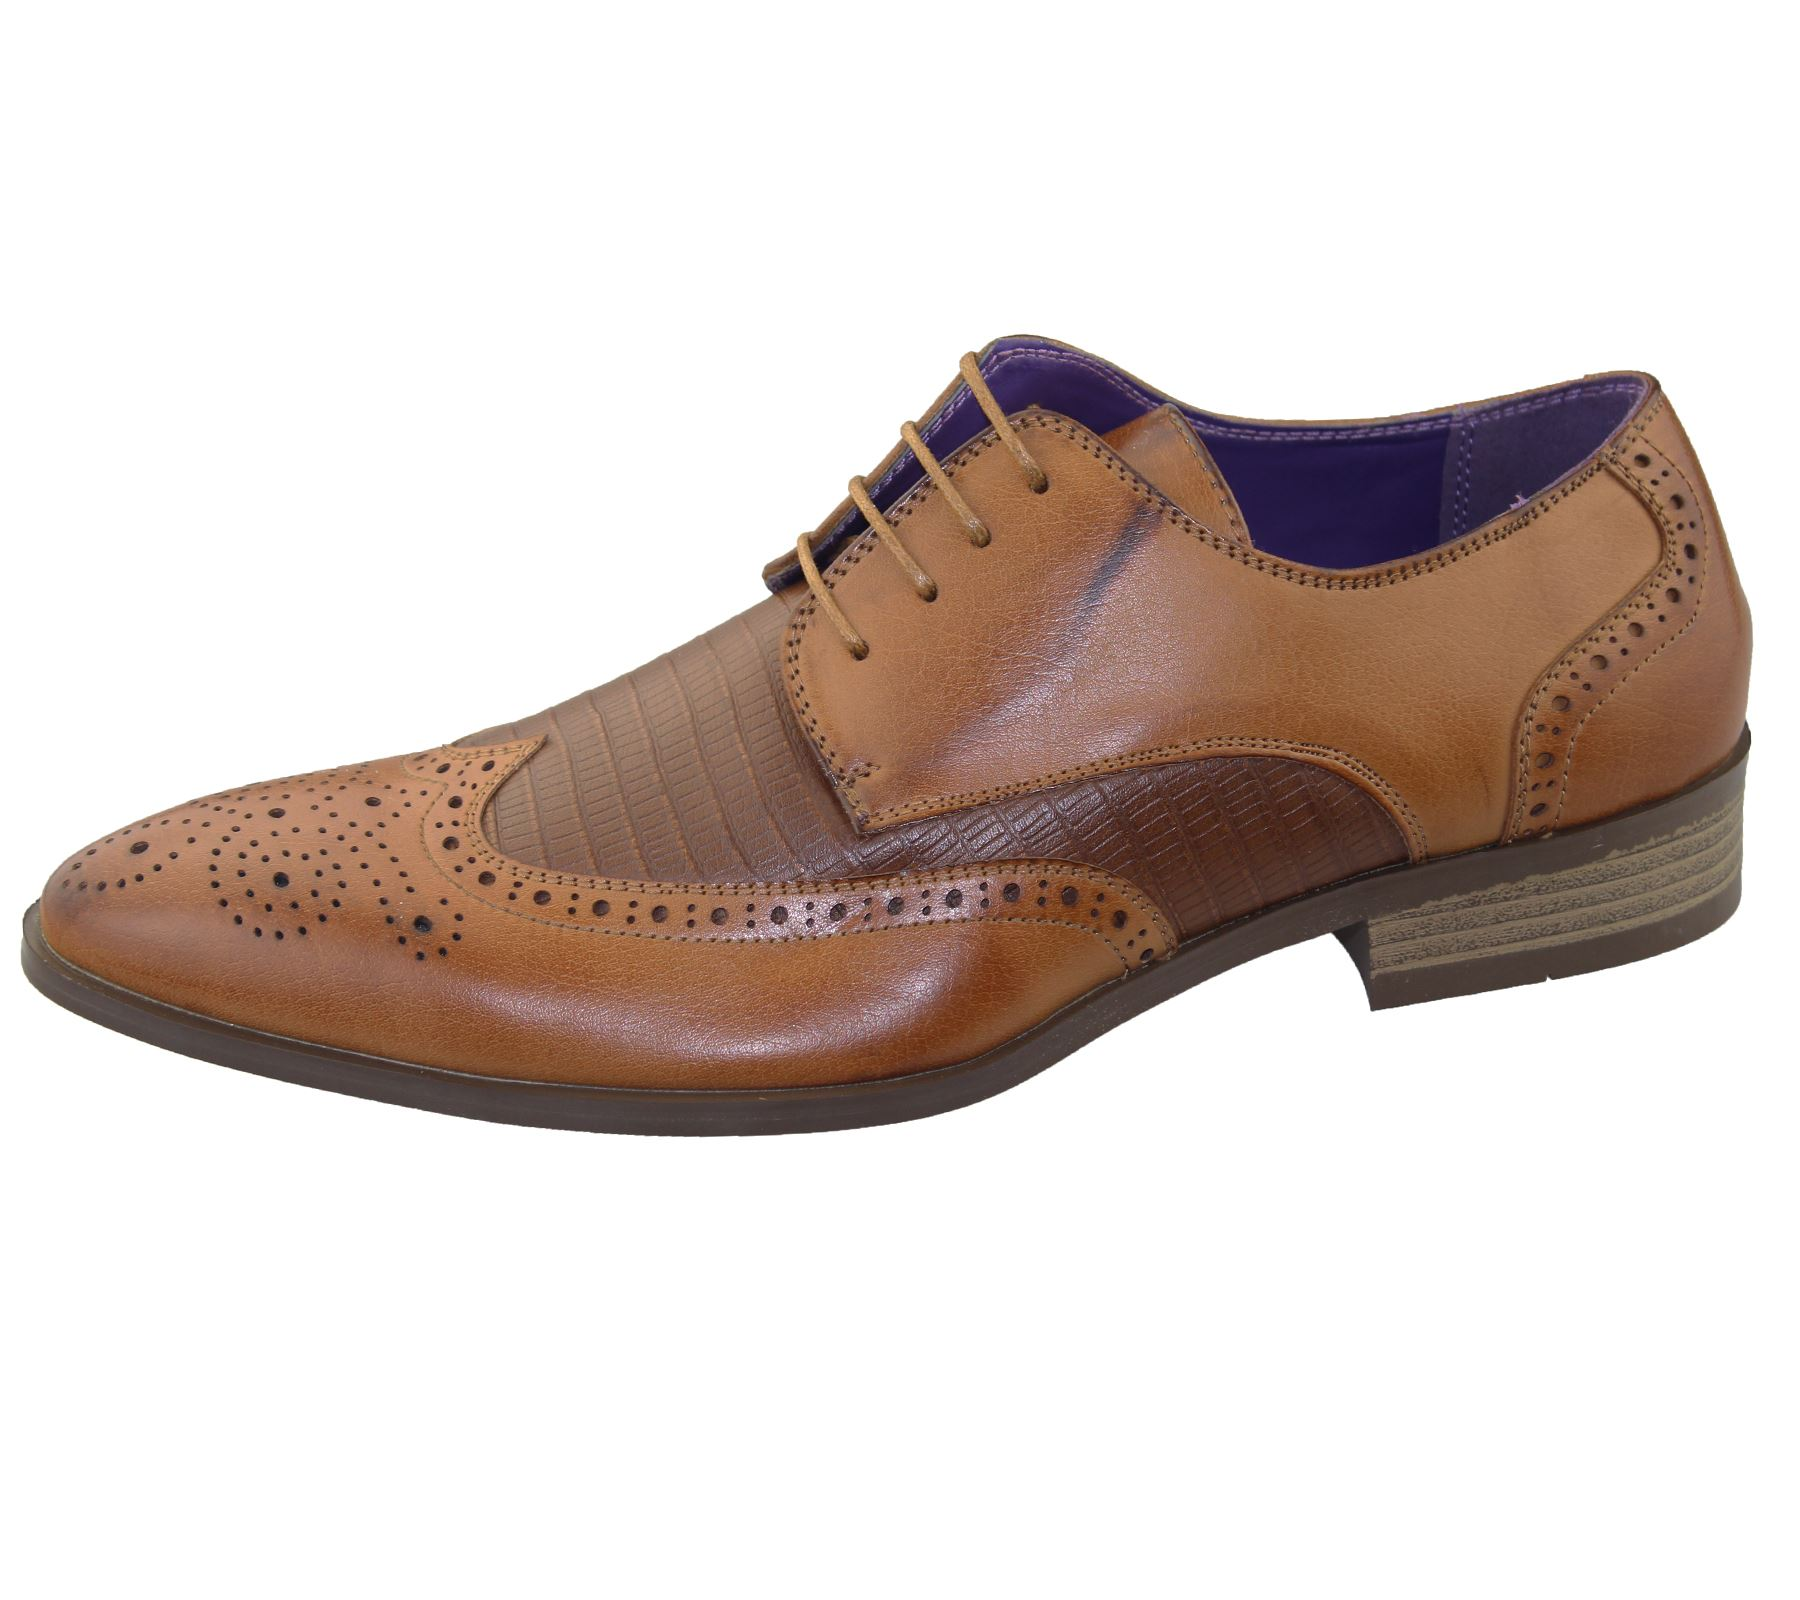 Mens Tan Dress Shoes Amazon